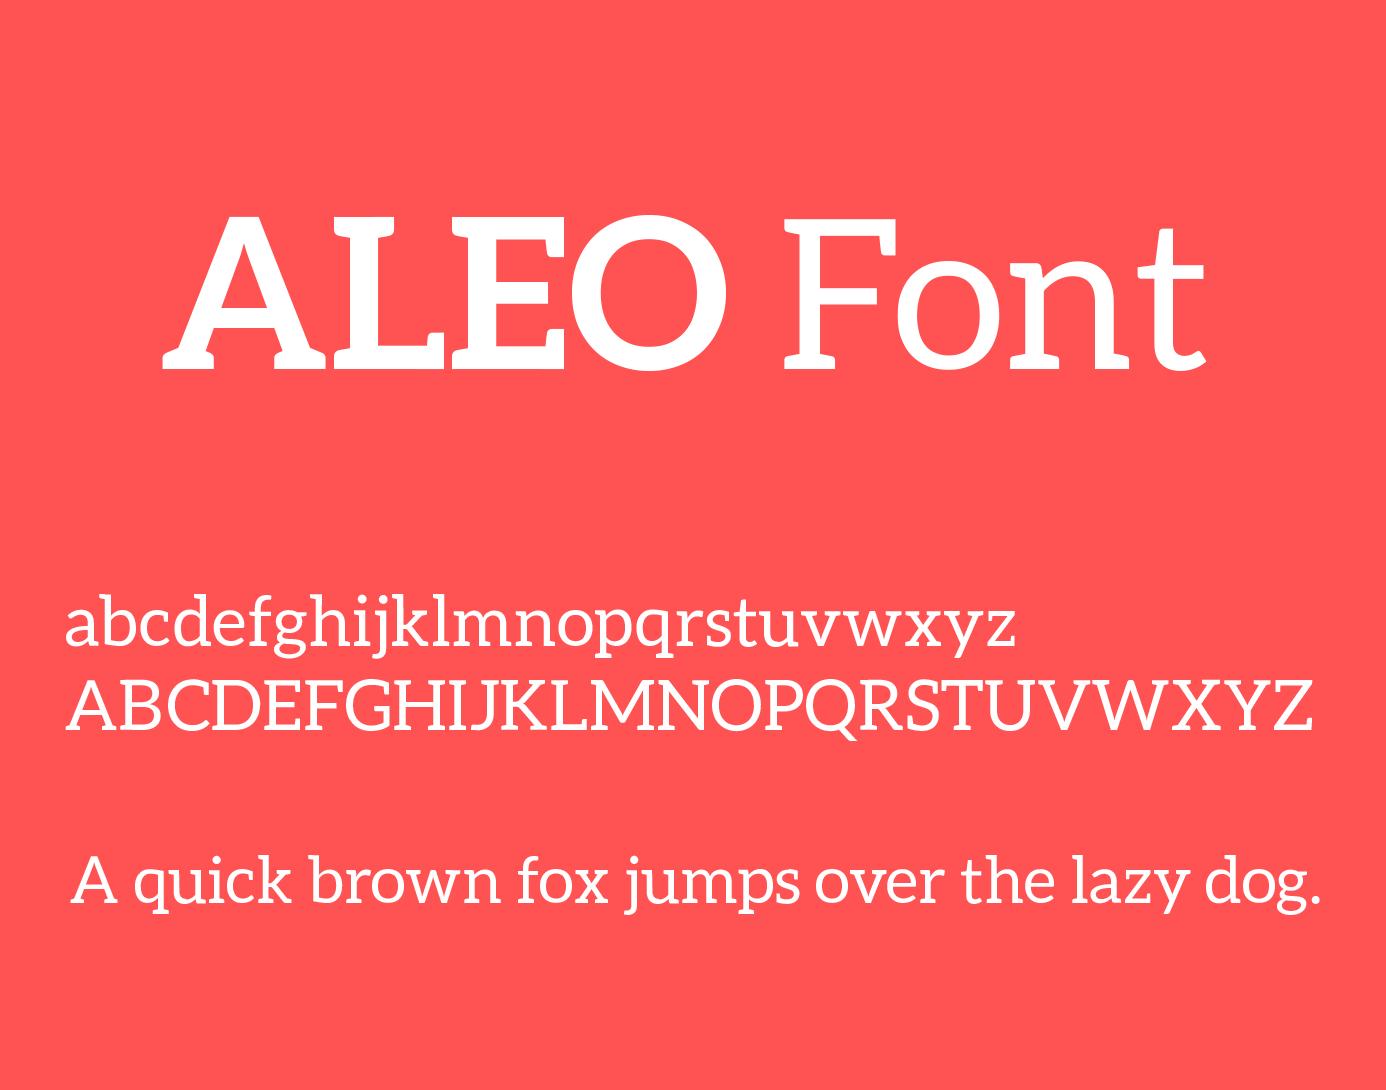 https://fontclarity.com/wp-content/uploads/2019/09/aleo-download-0.png Free Download